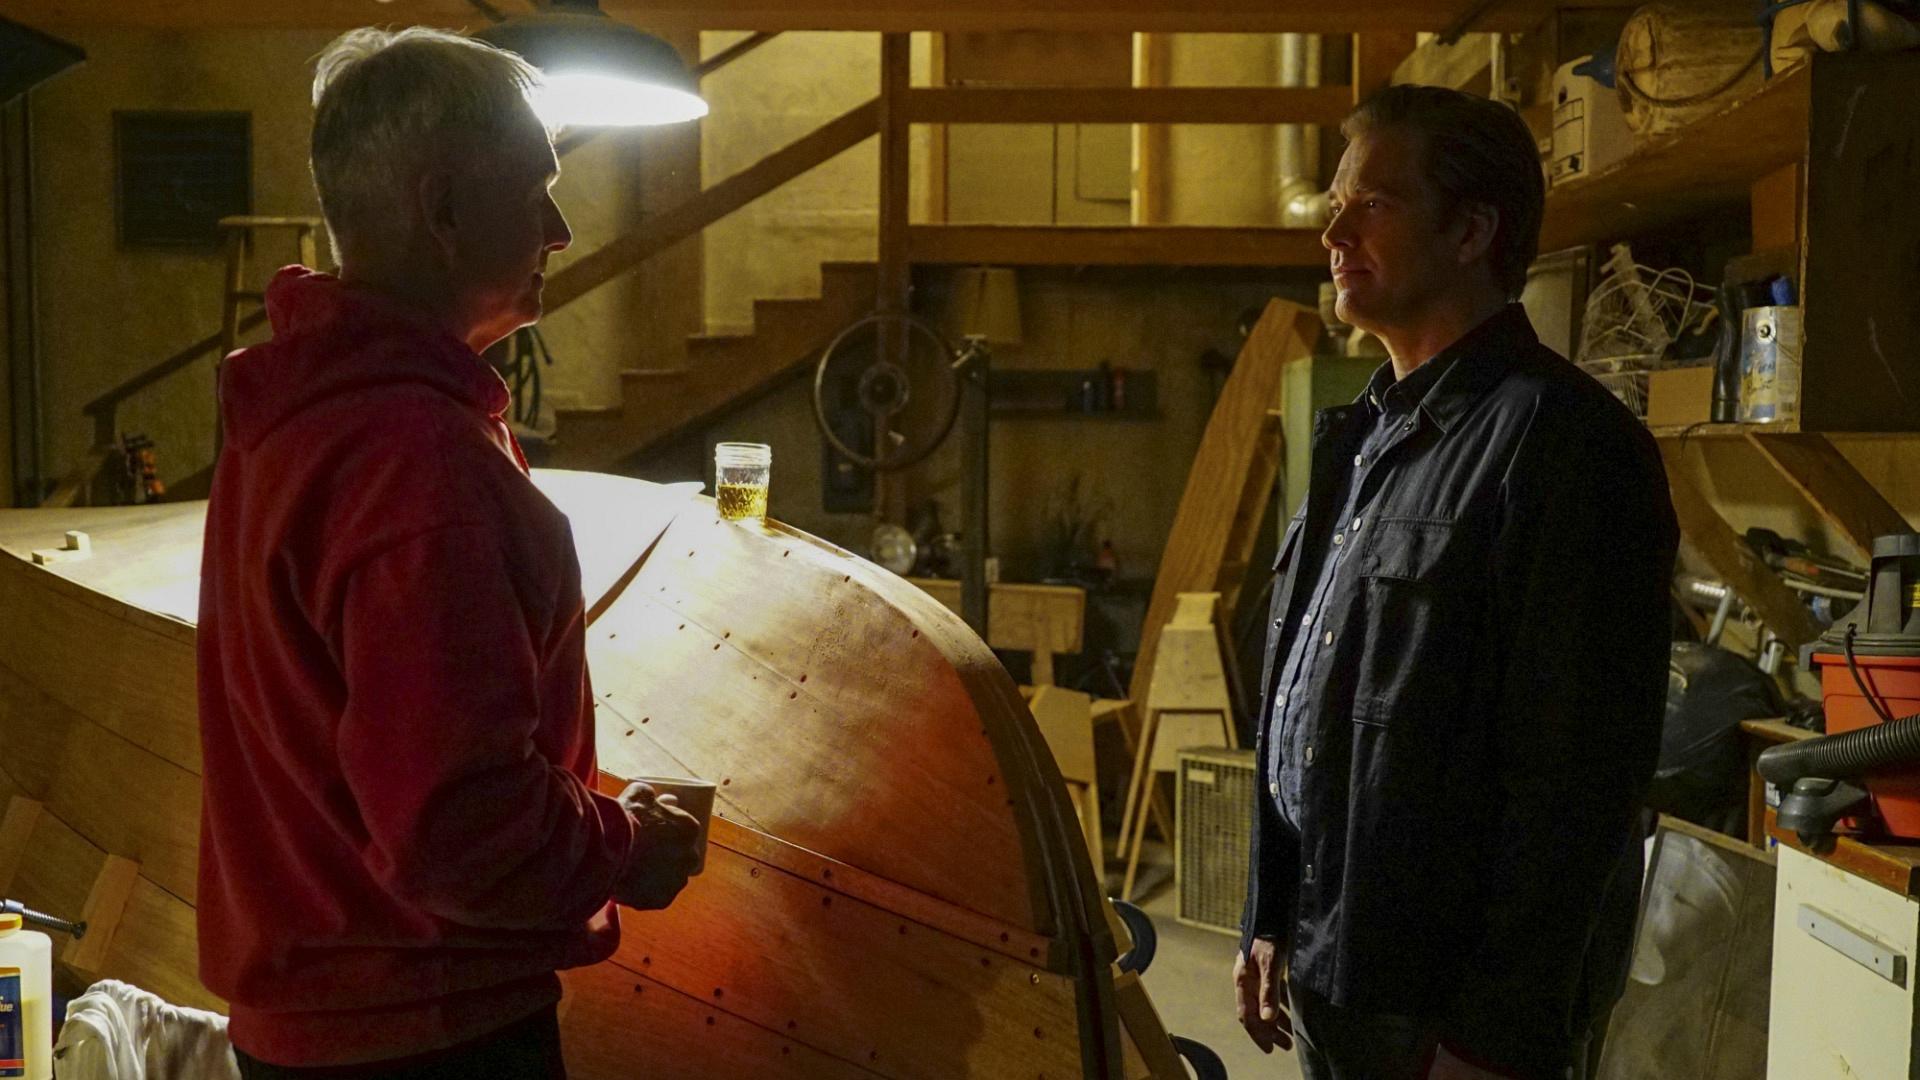 DiNozzo stops by Gibbs' basement.